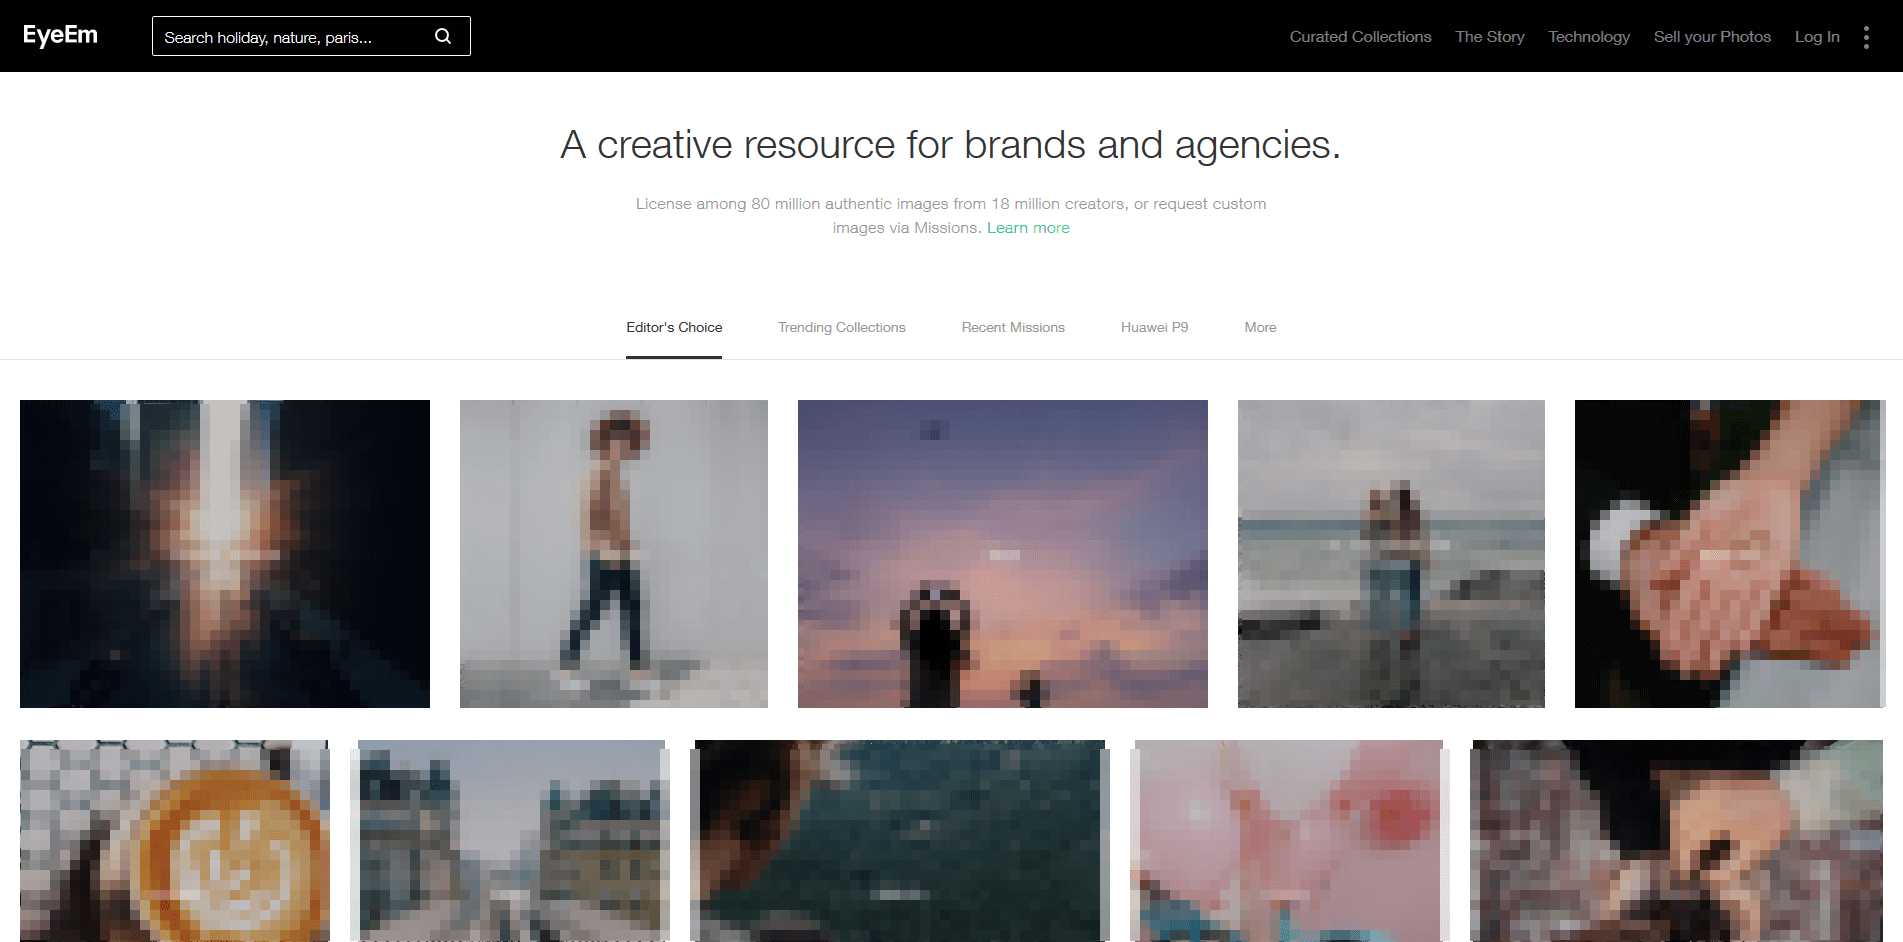 Homepage for the EyeEm browser website